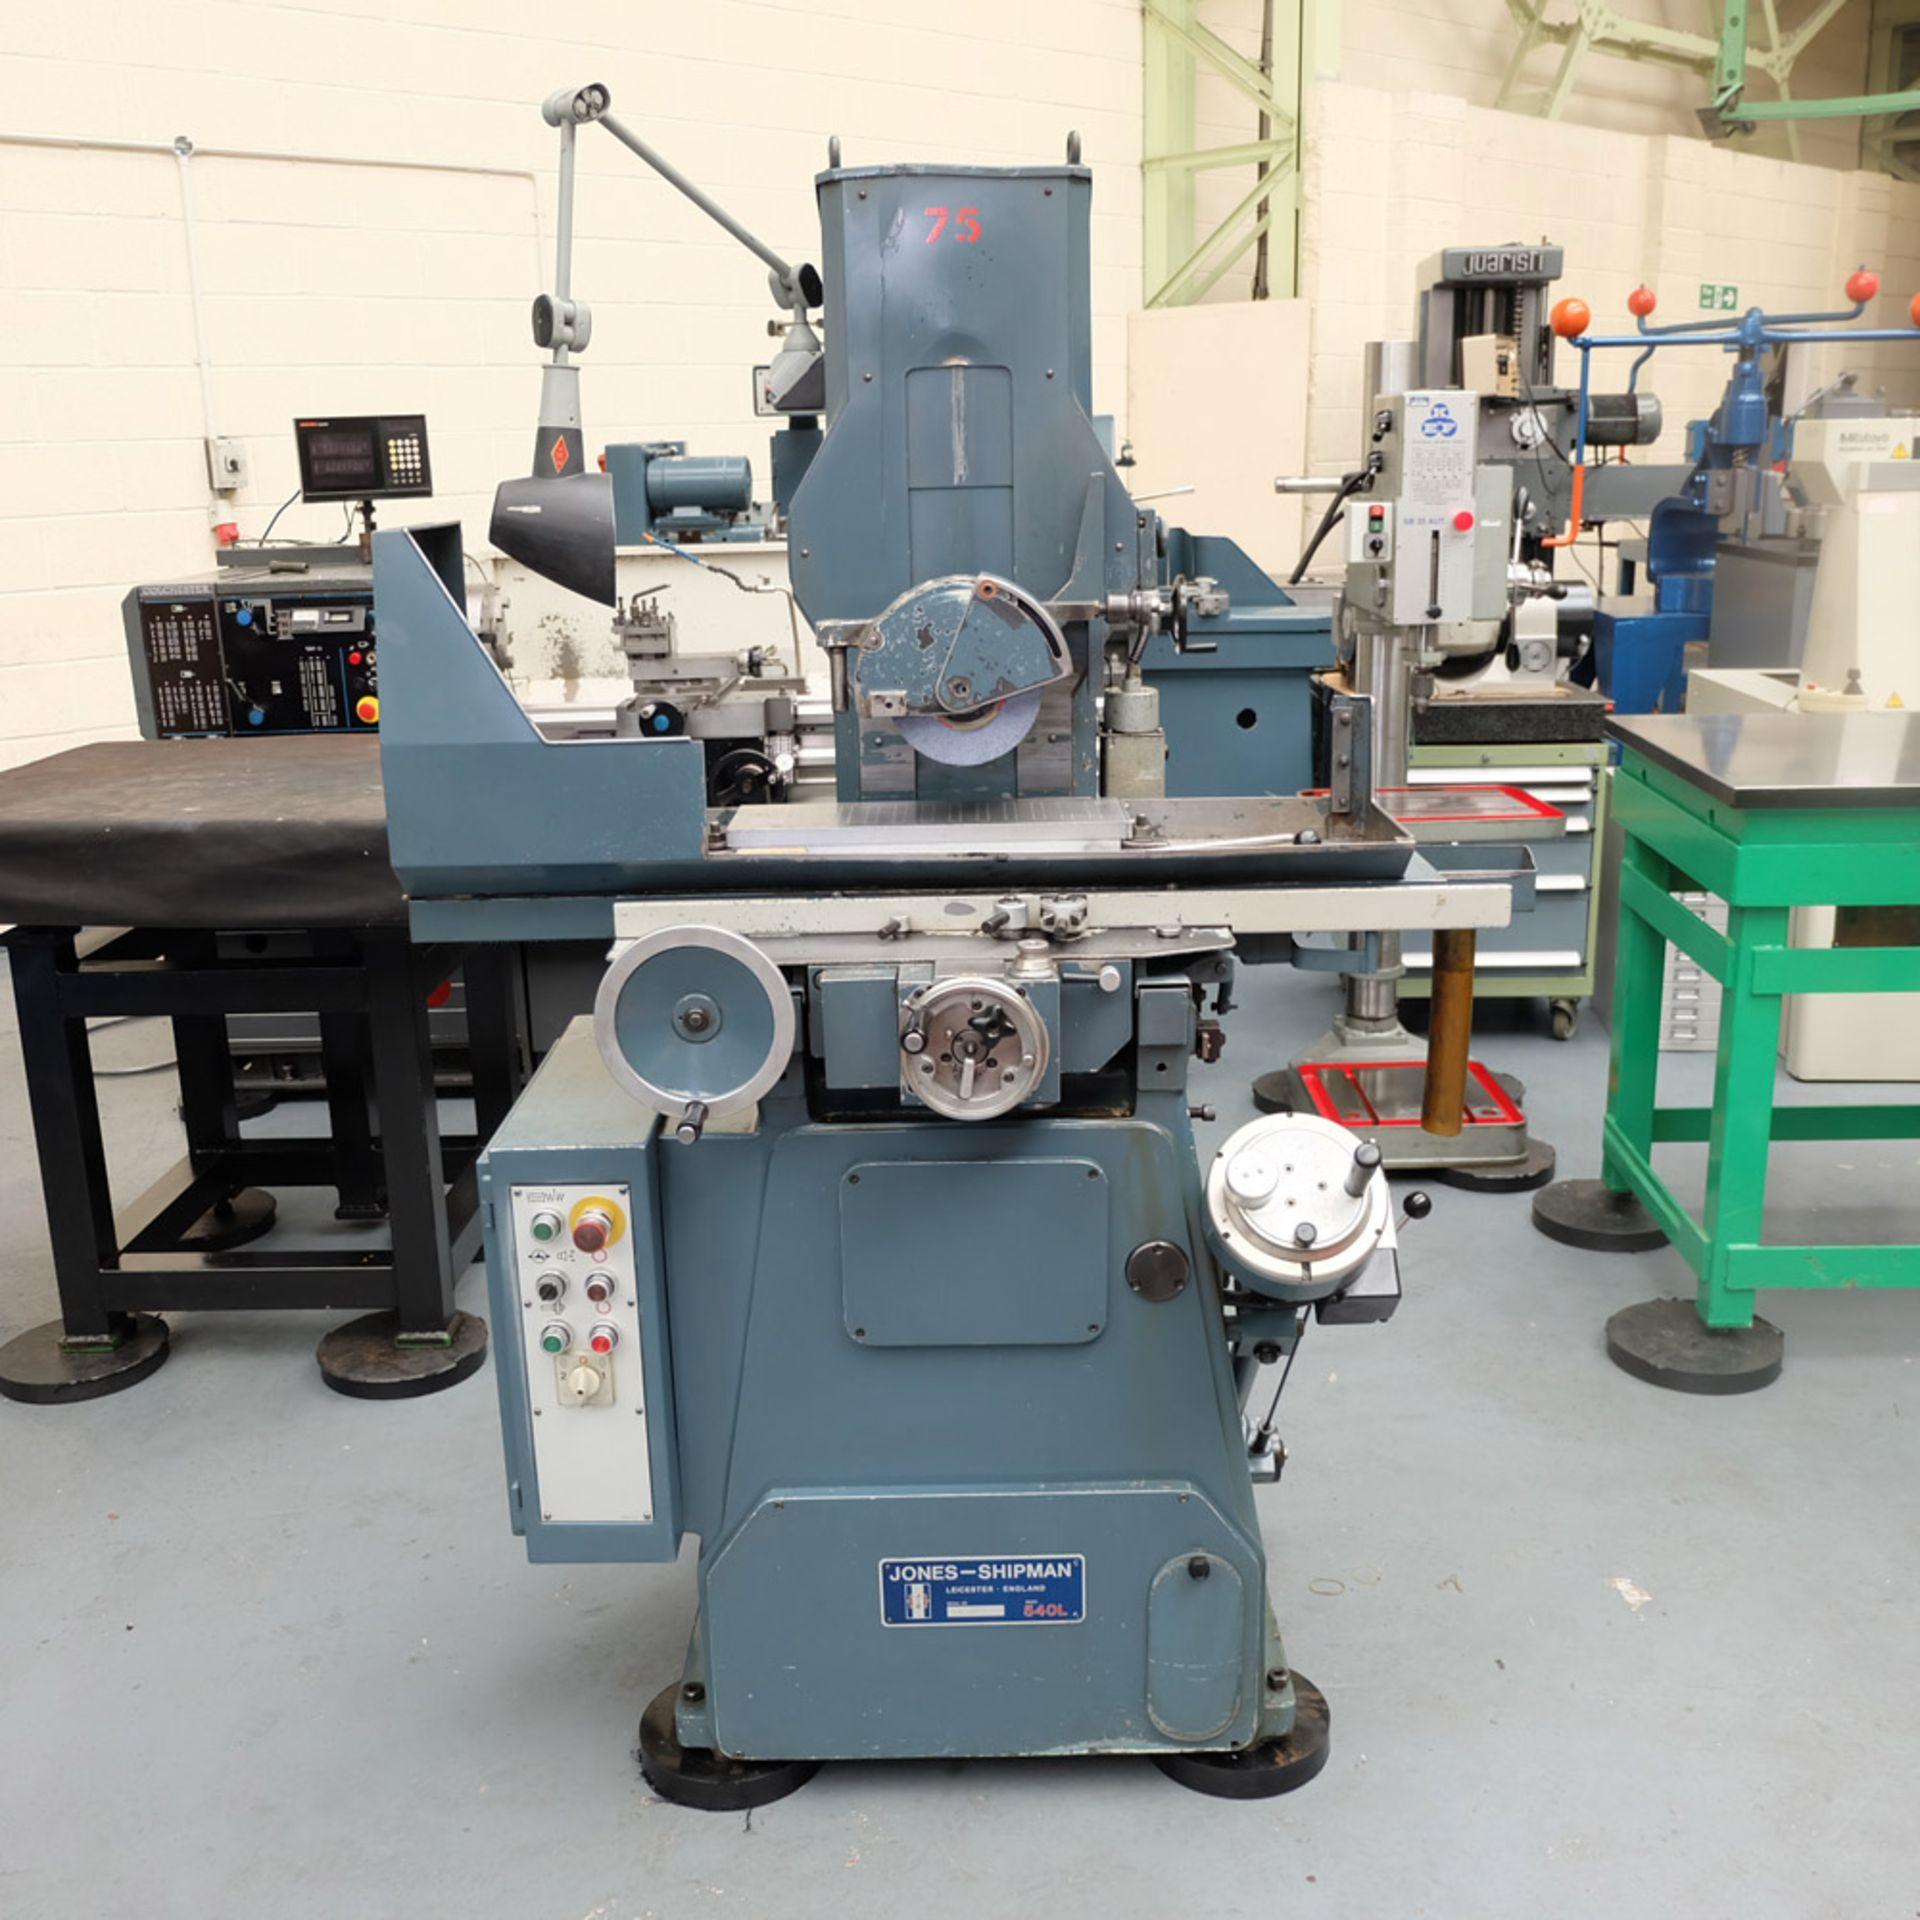 "Jones & Shipman 540L Tool Room Surface Grinder. Capacity 18"" x 6""."